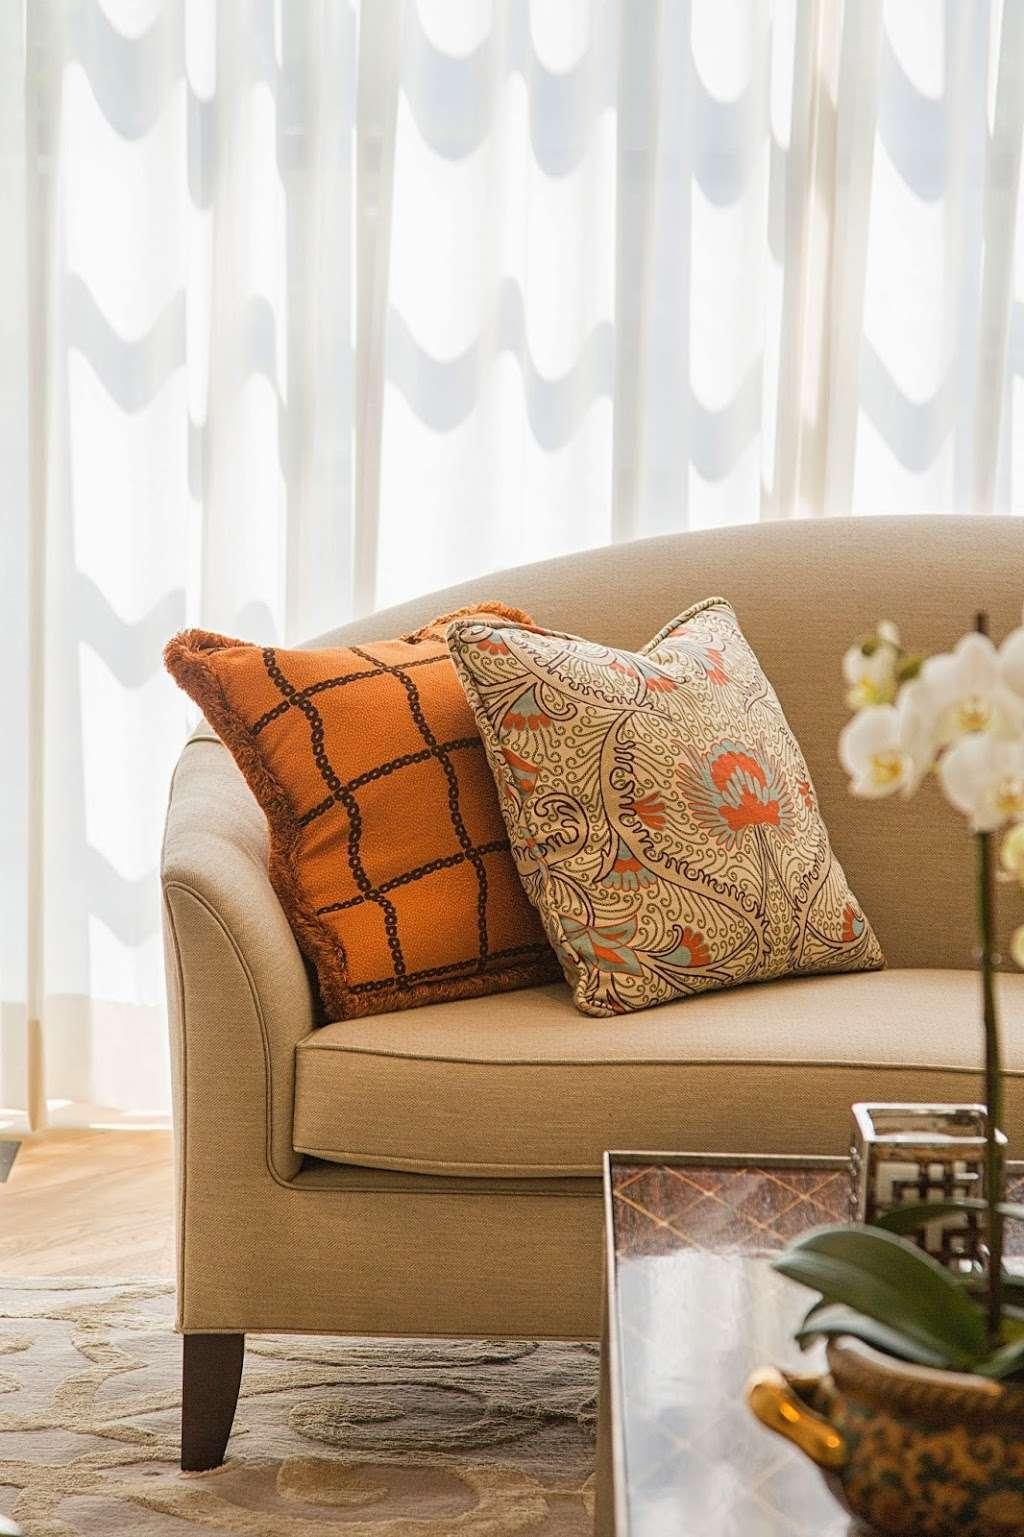 Alan Schatzberg & Associates Inc - furniture store  | Photo 9 of 10 | Address: 45 Ruta Ct, South Hackensack, NJ 07606, USA | Phone: (201) 440-8855